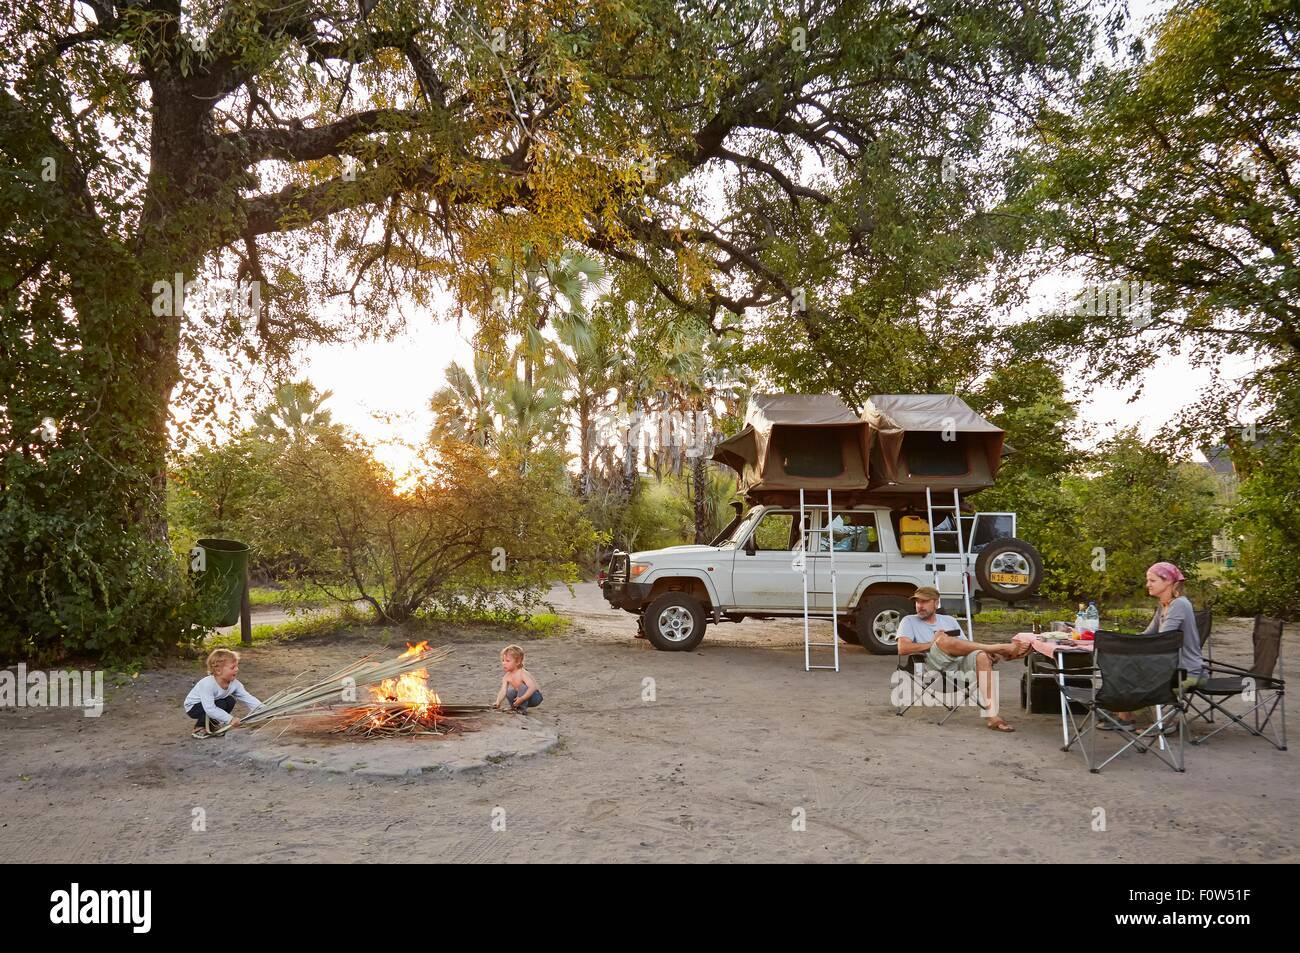 Off road vehicle parked, family relaxing around camp fire, Nata, Makgadikgadi, Botswana - Stock Image